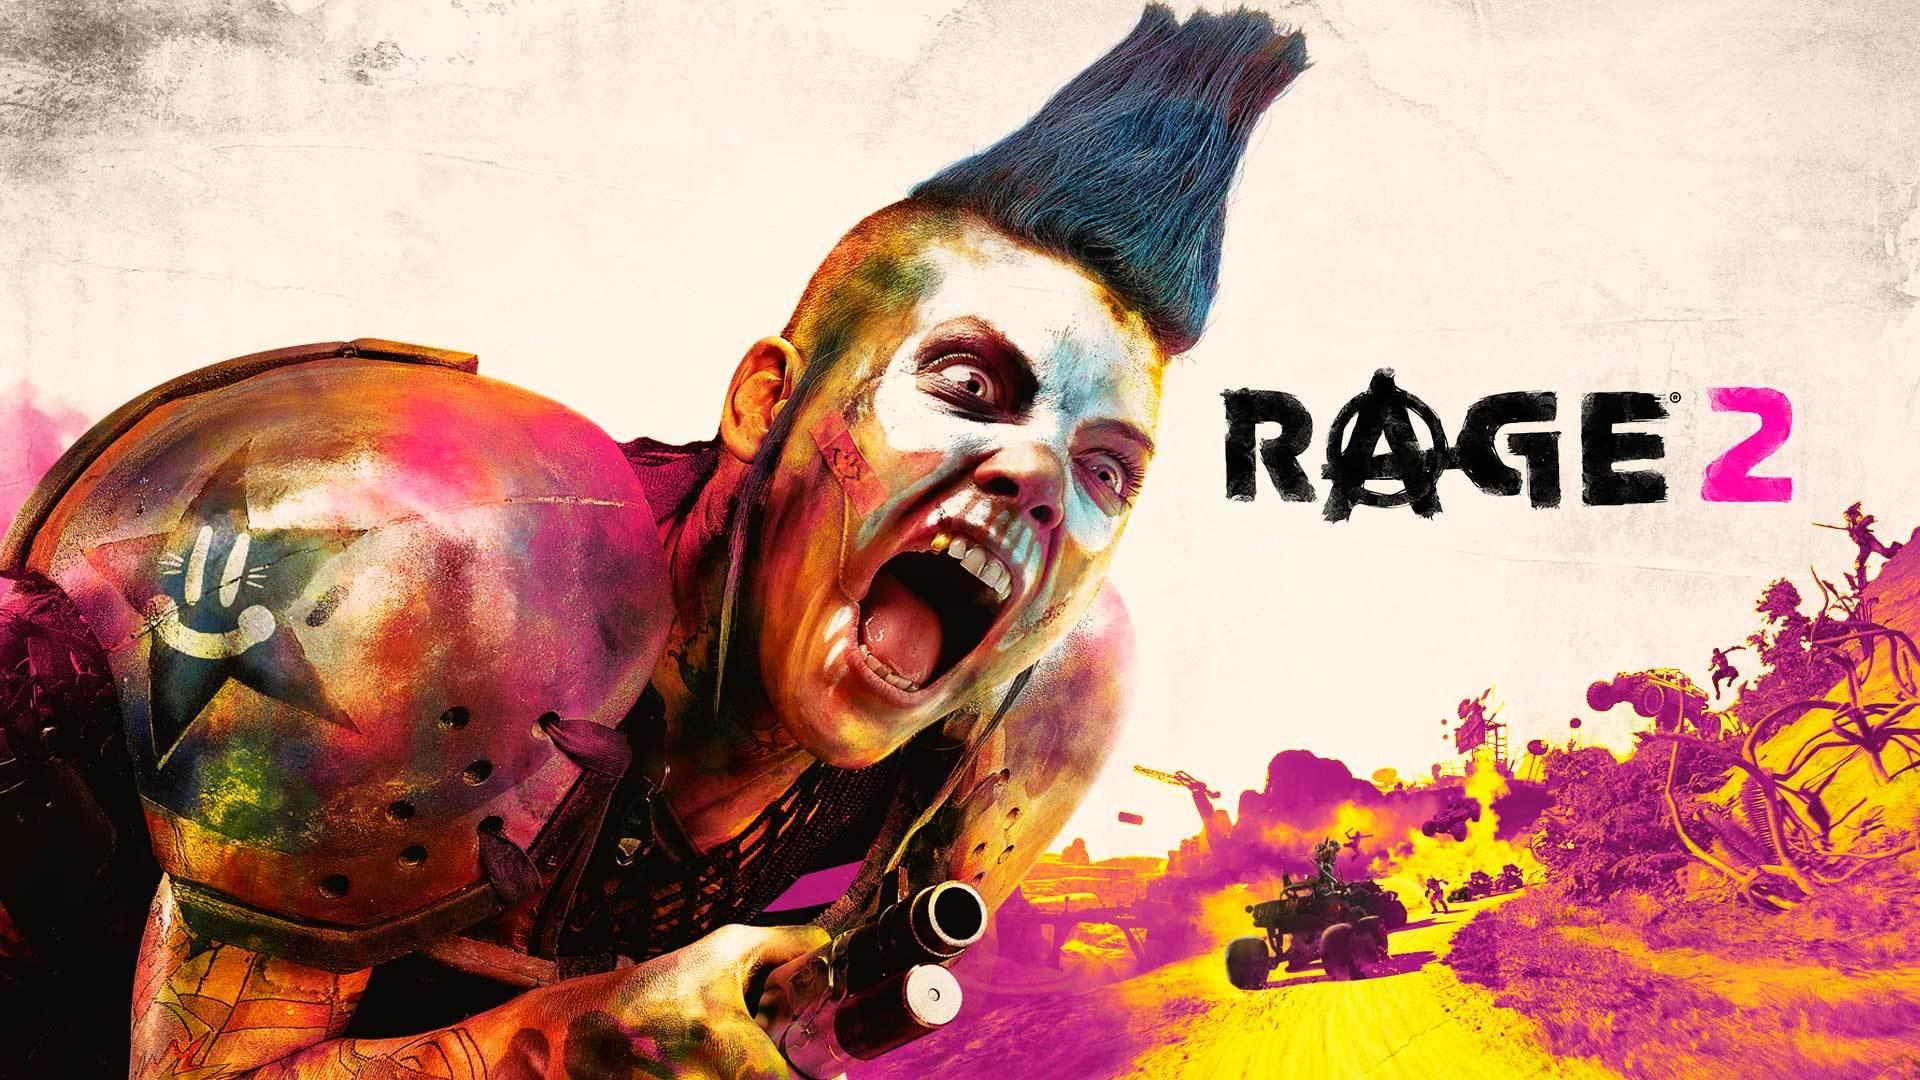 rage-2-pc-big-fd08.jpg